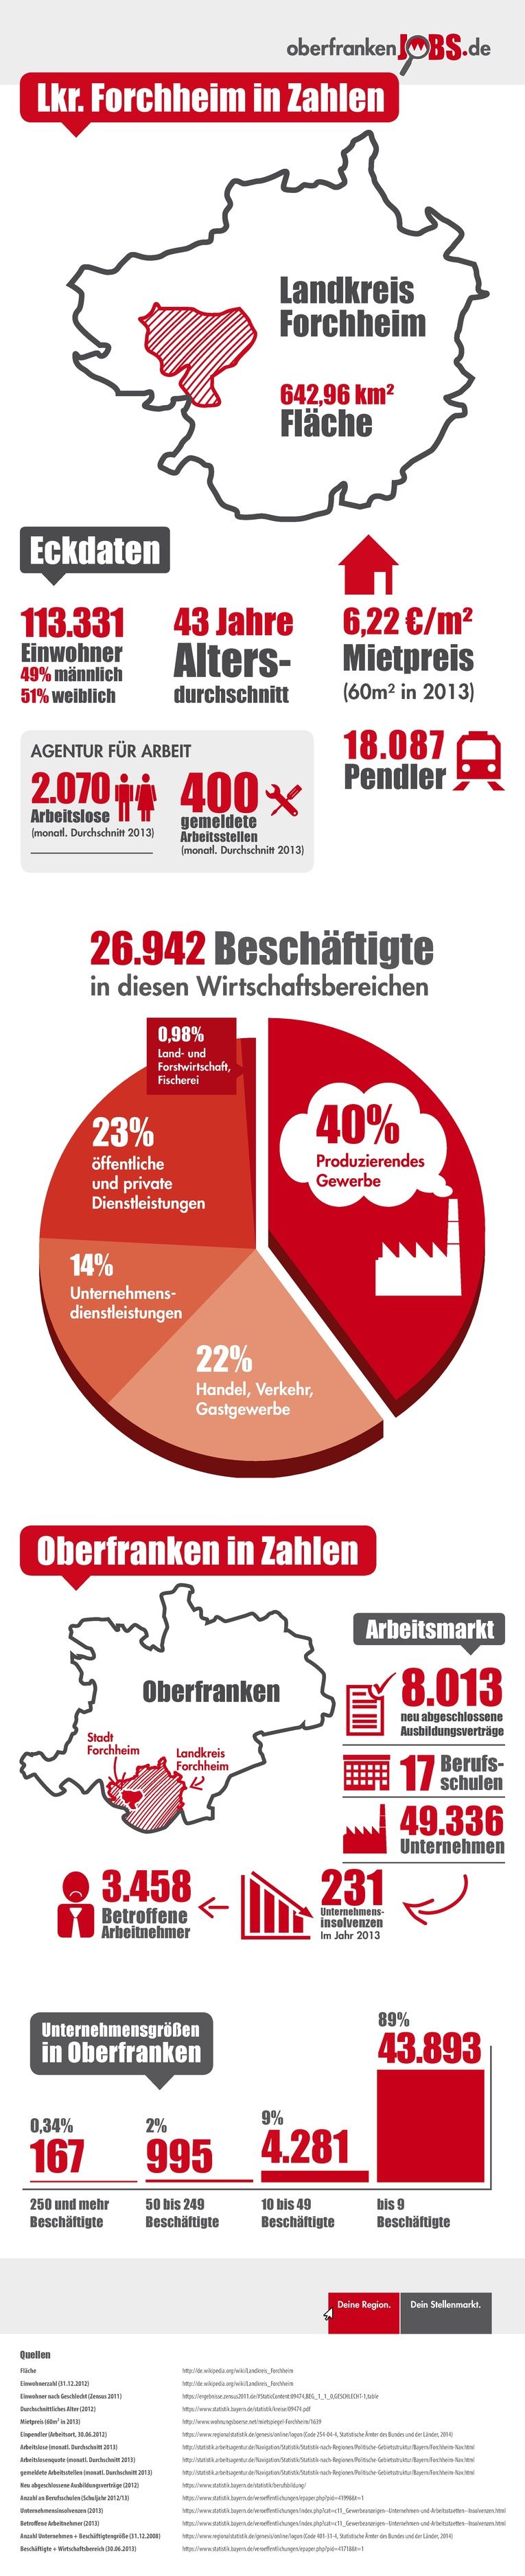 Infografik Forchheim